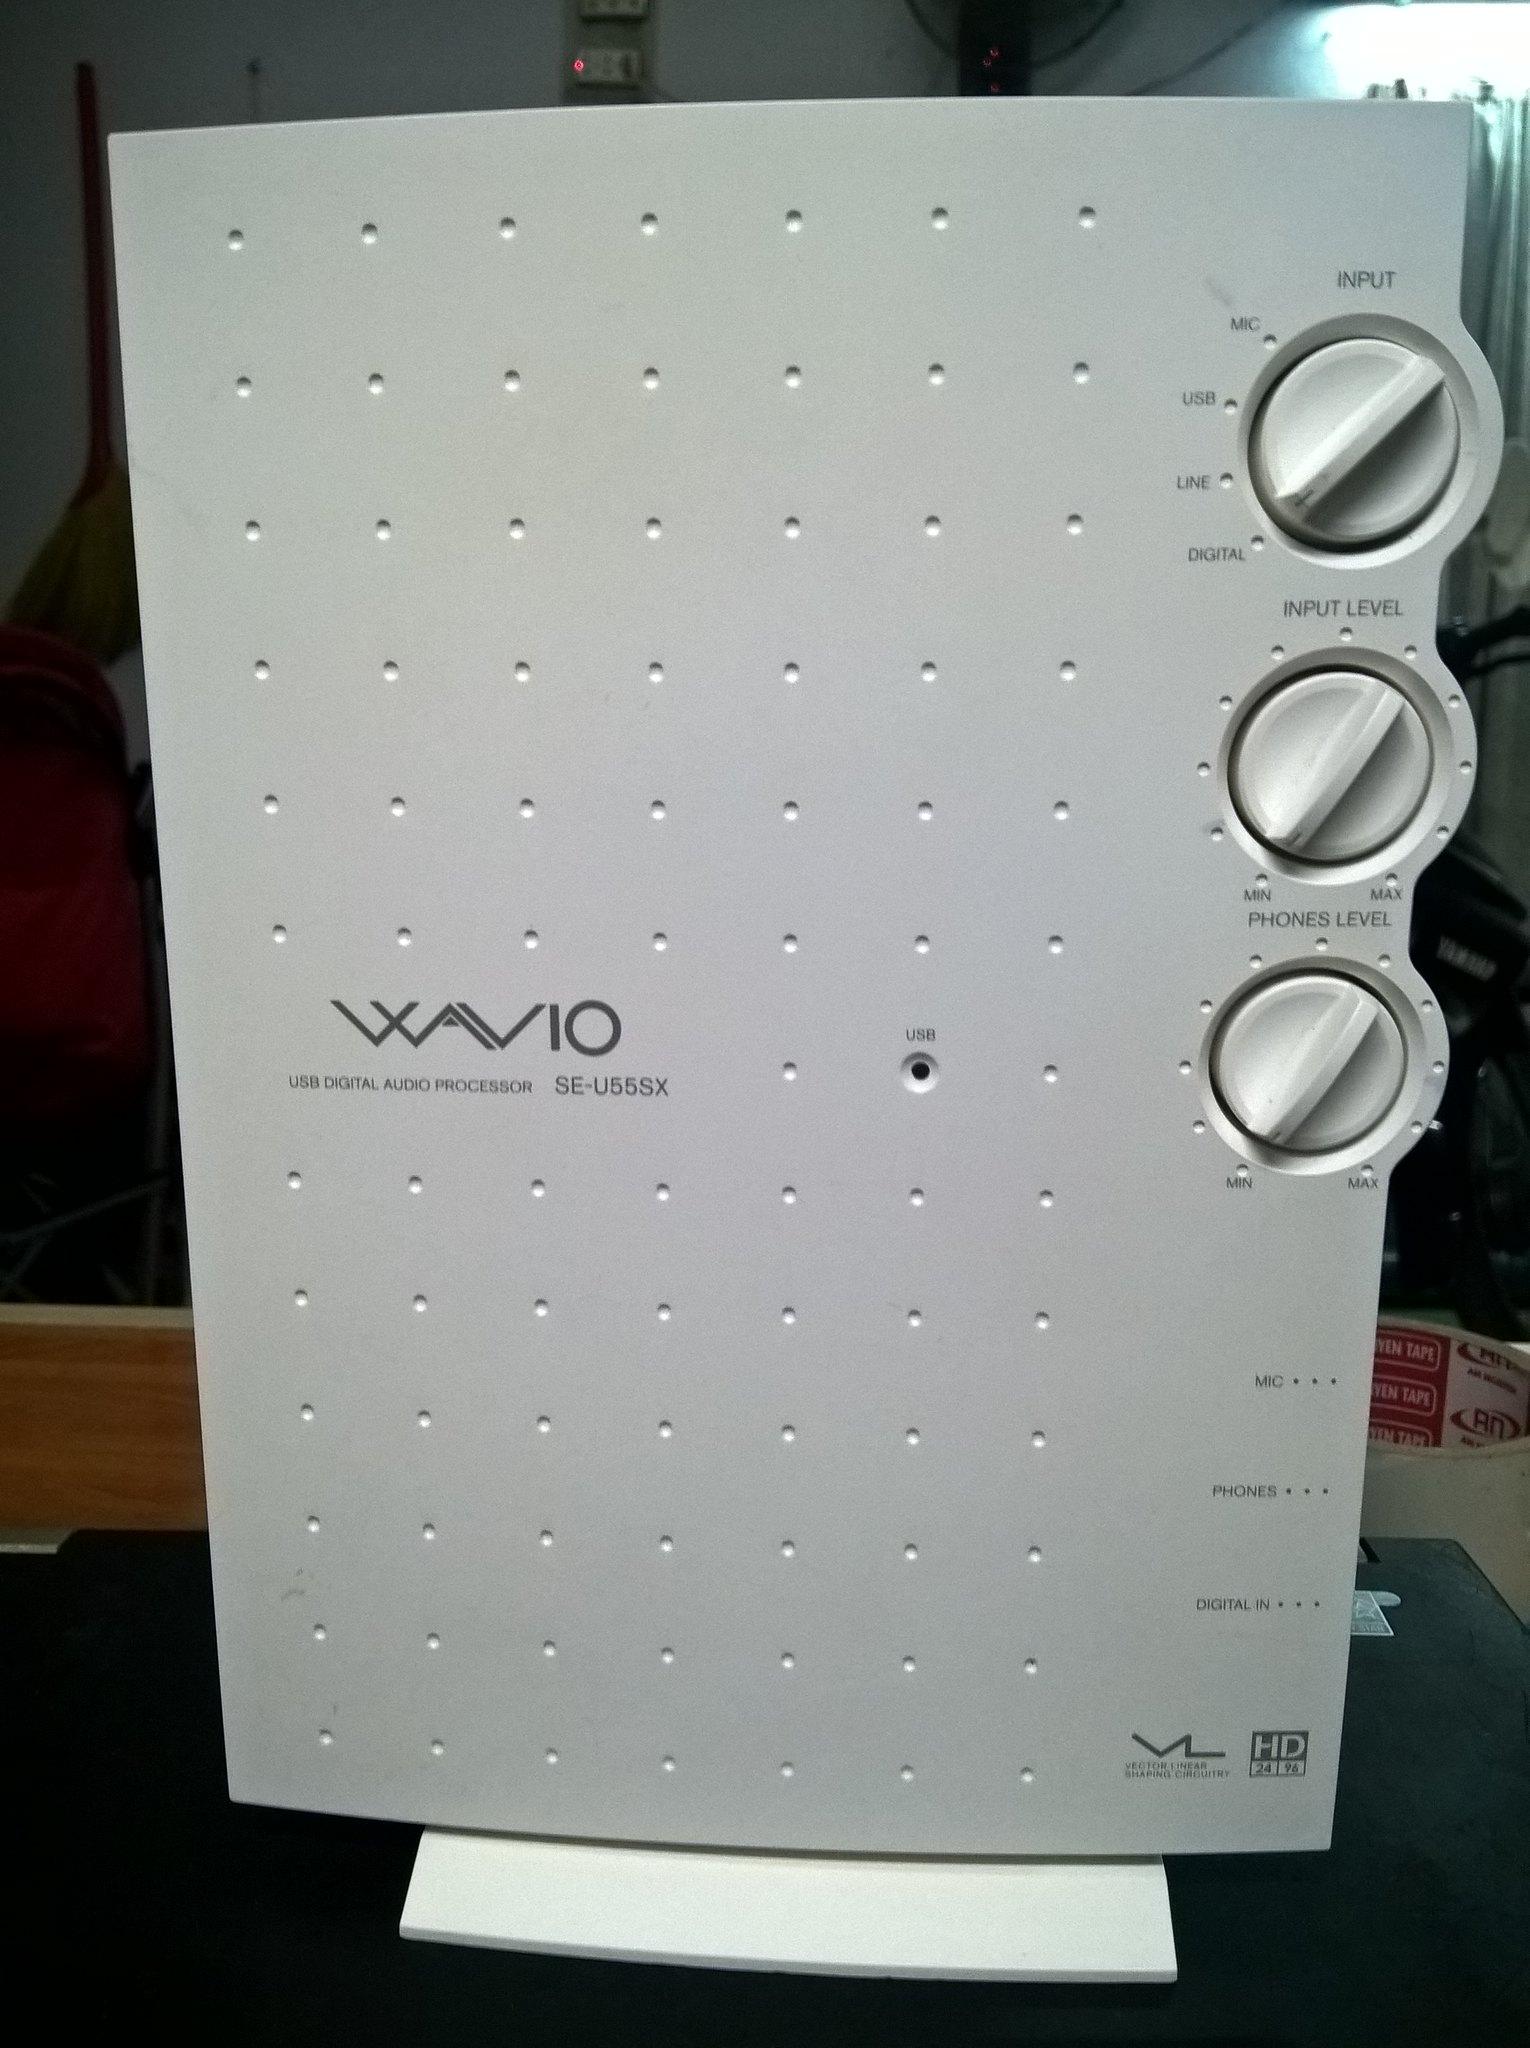 Onkyo từ Japan - U55SX, U55SX2, 200PCI LTD, 200PCI, 150PCI, 90PCI